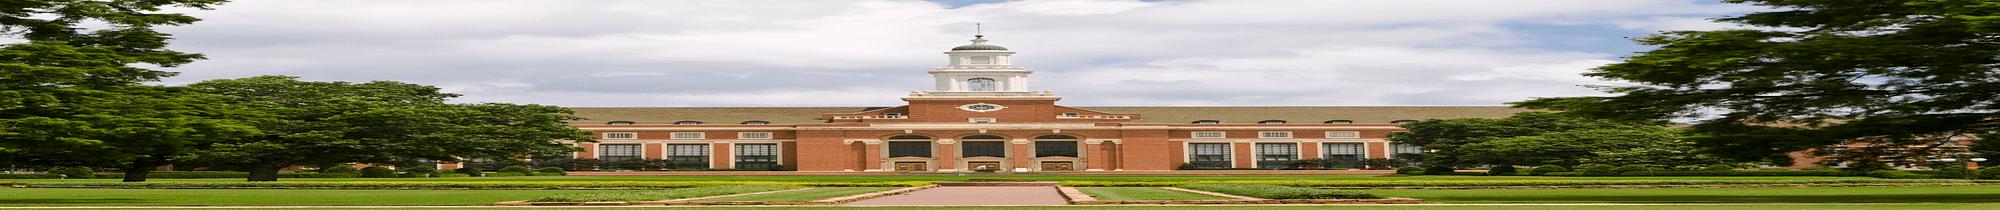 Okstate Academic Calendar 2022.Oklahoma State University Osu Stillwater Courses Fees Ranking Admission Criteria